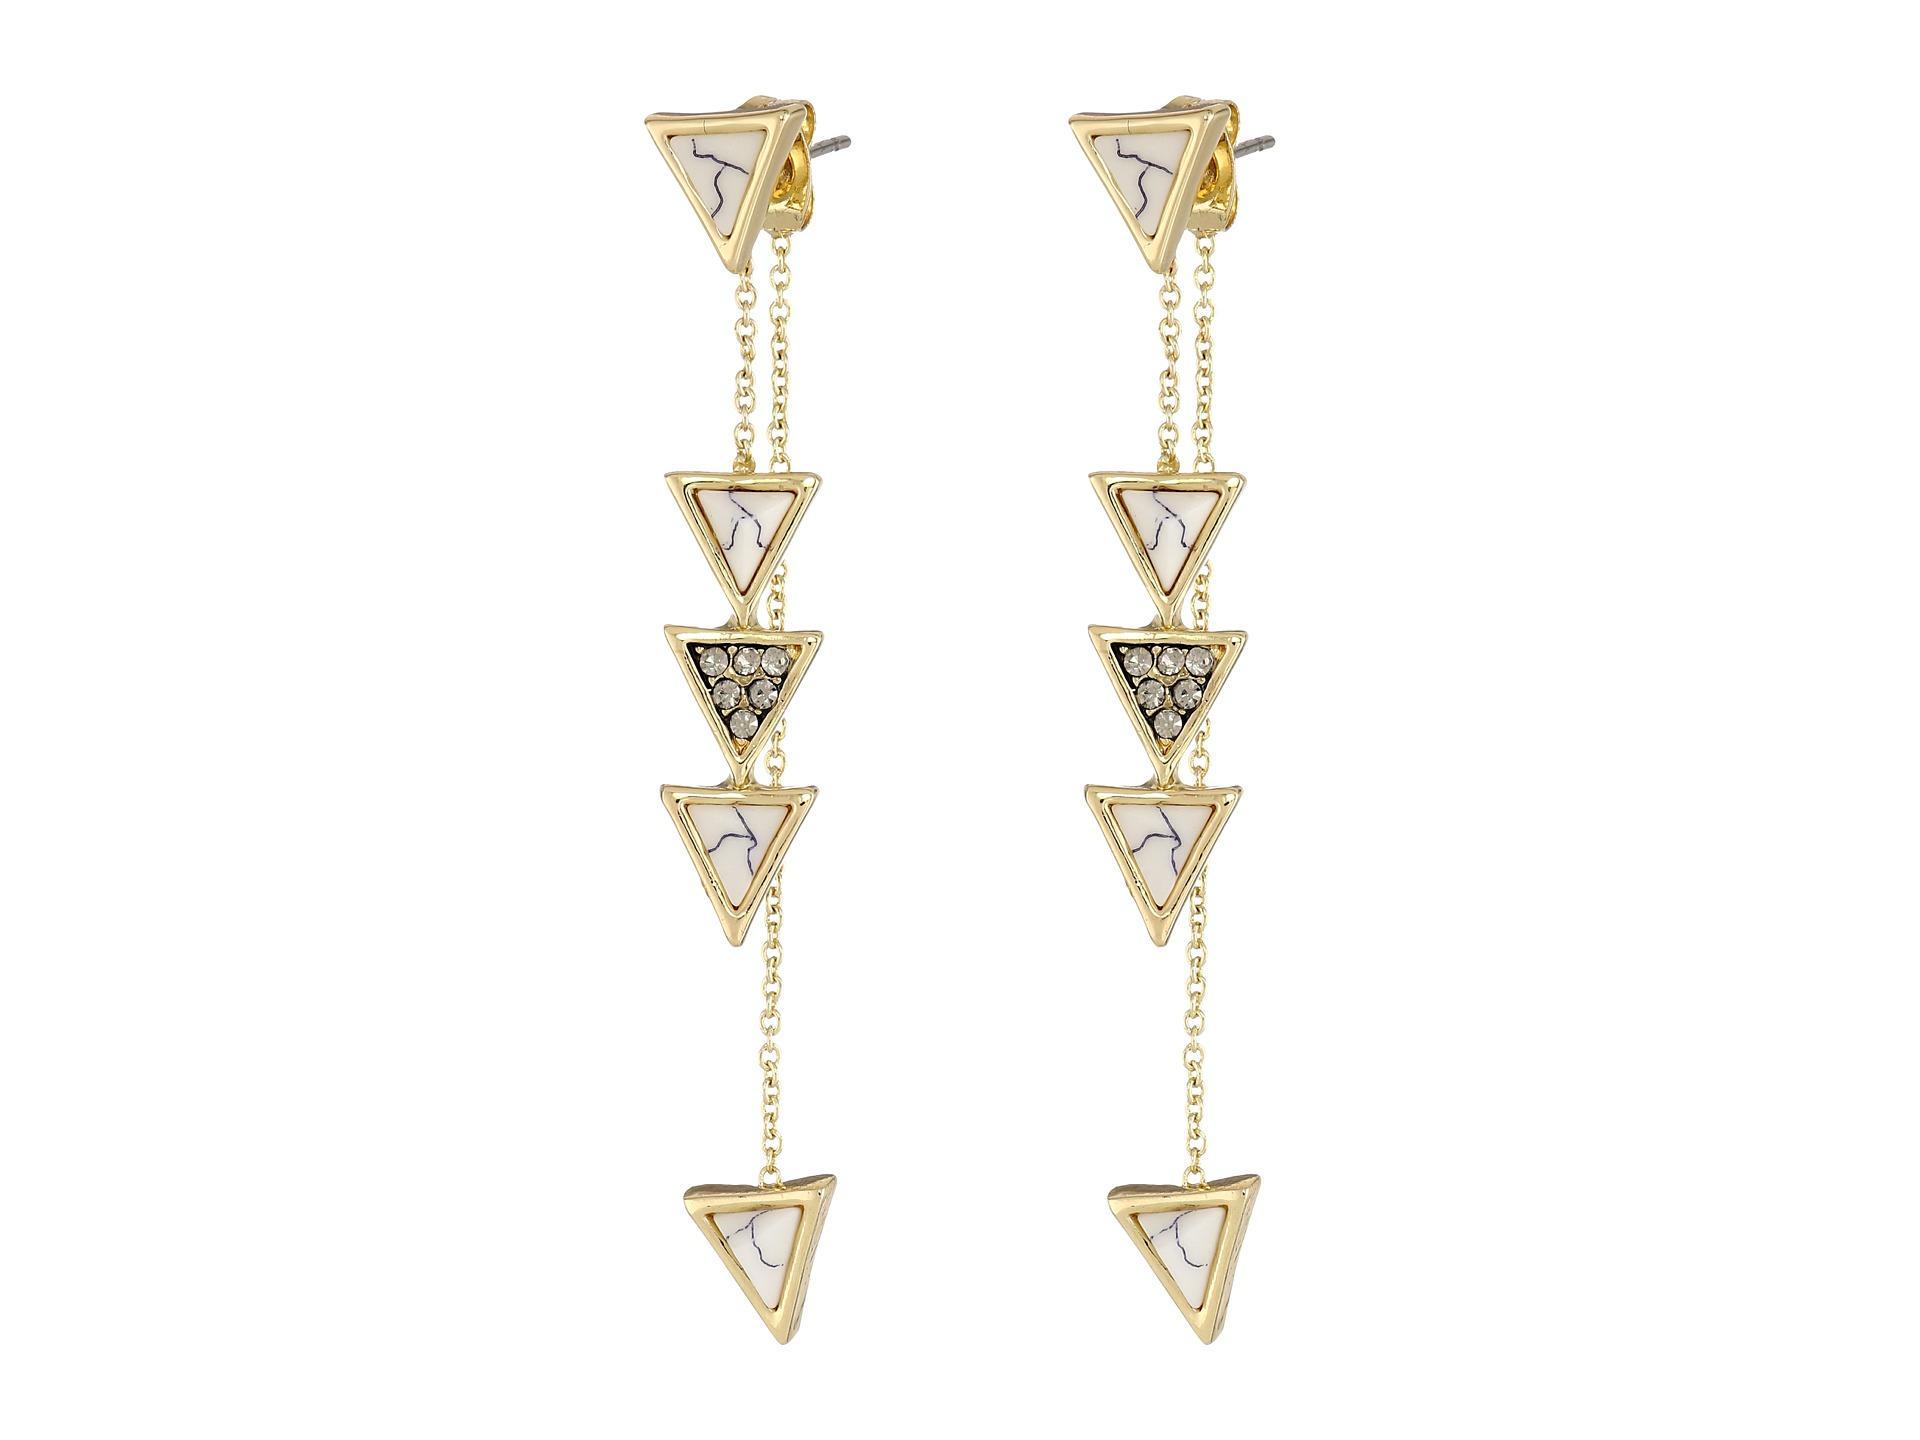 house of harlow 1960 triangle trellis drop earrings